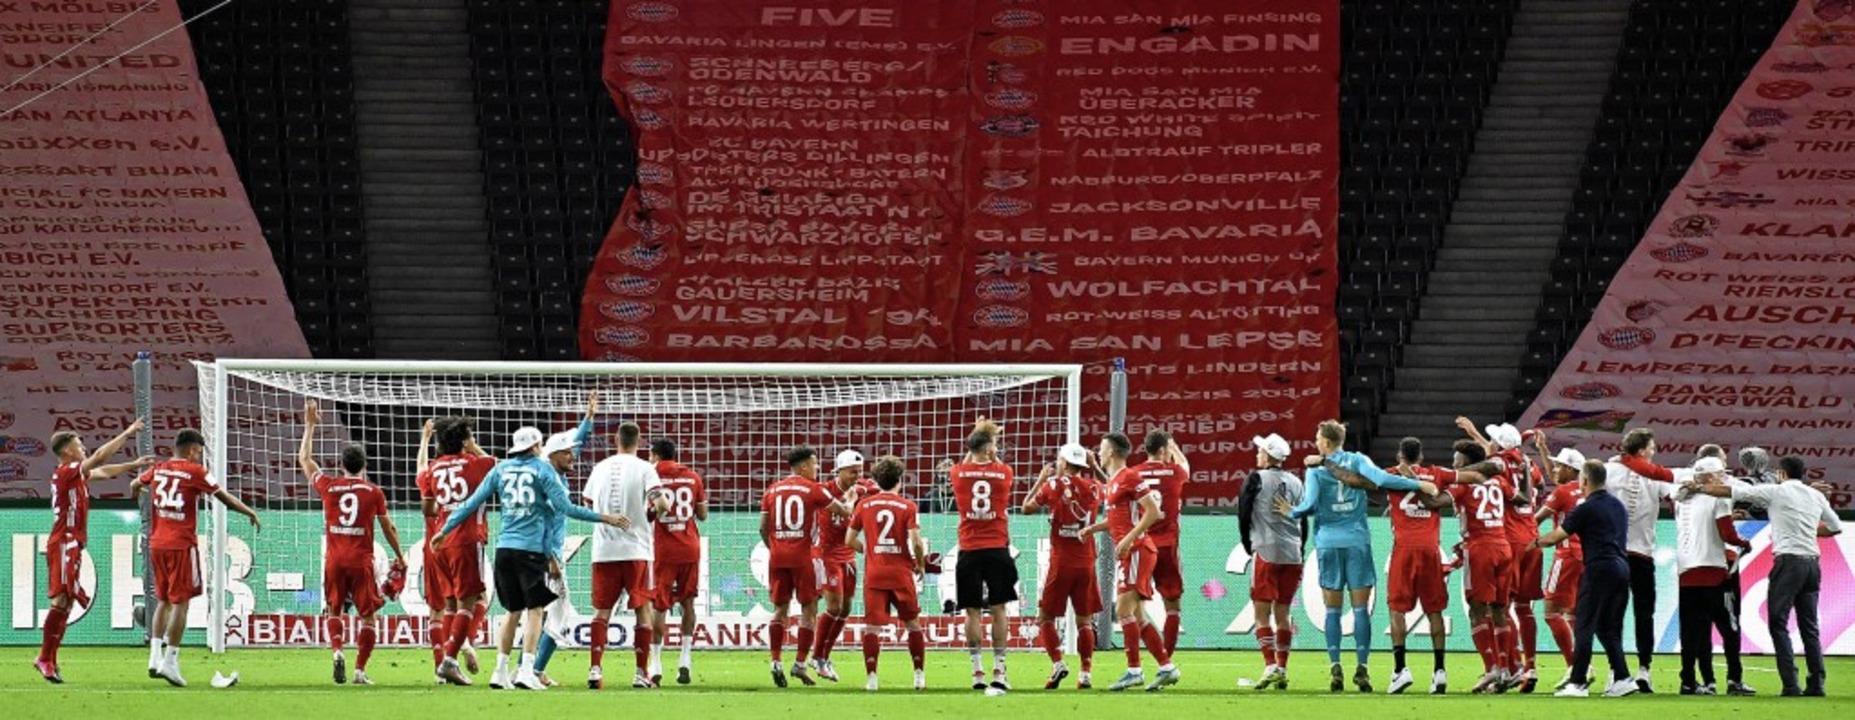 Feiern vor trister Kulisse: Die Bayern...en Rängen im Berliner Olympiastadion.   | Foto: John Macdougall (dpa)